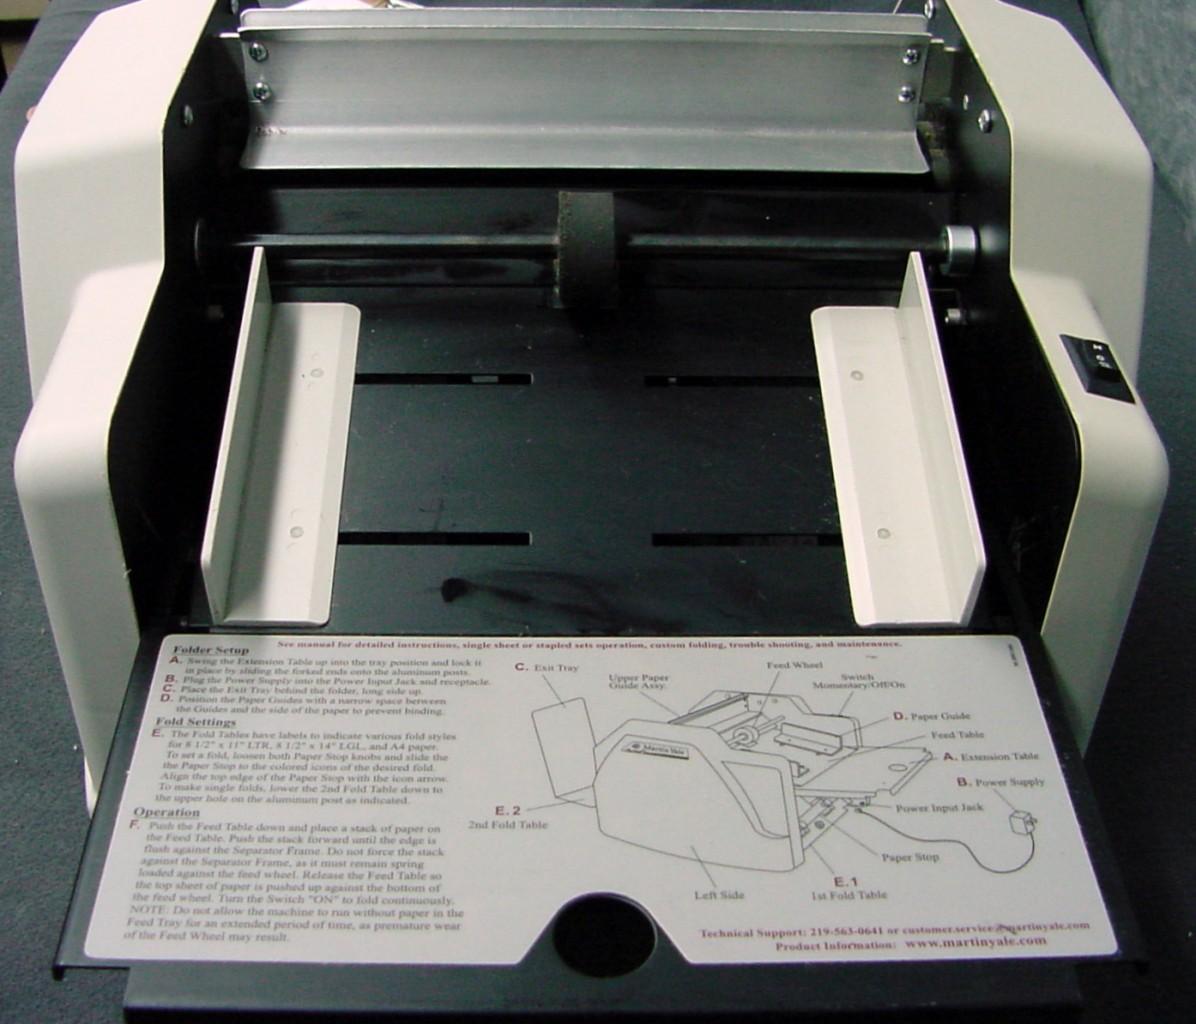 Martin Yale Auto Paper Folder 1501x